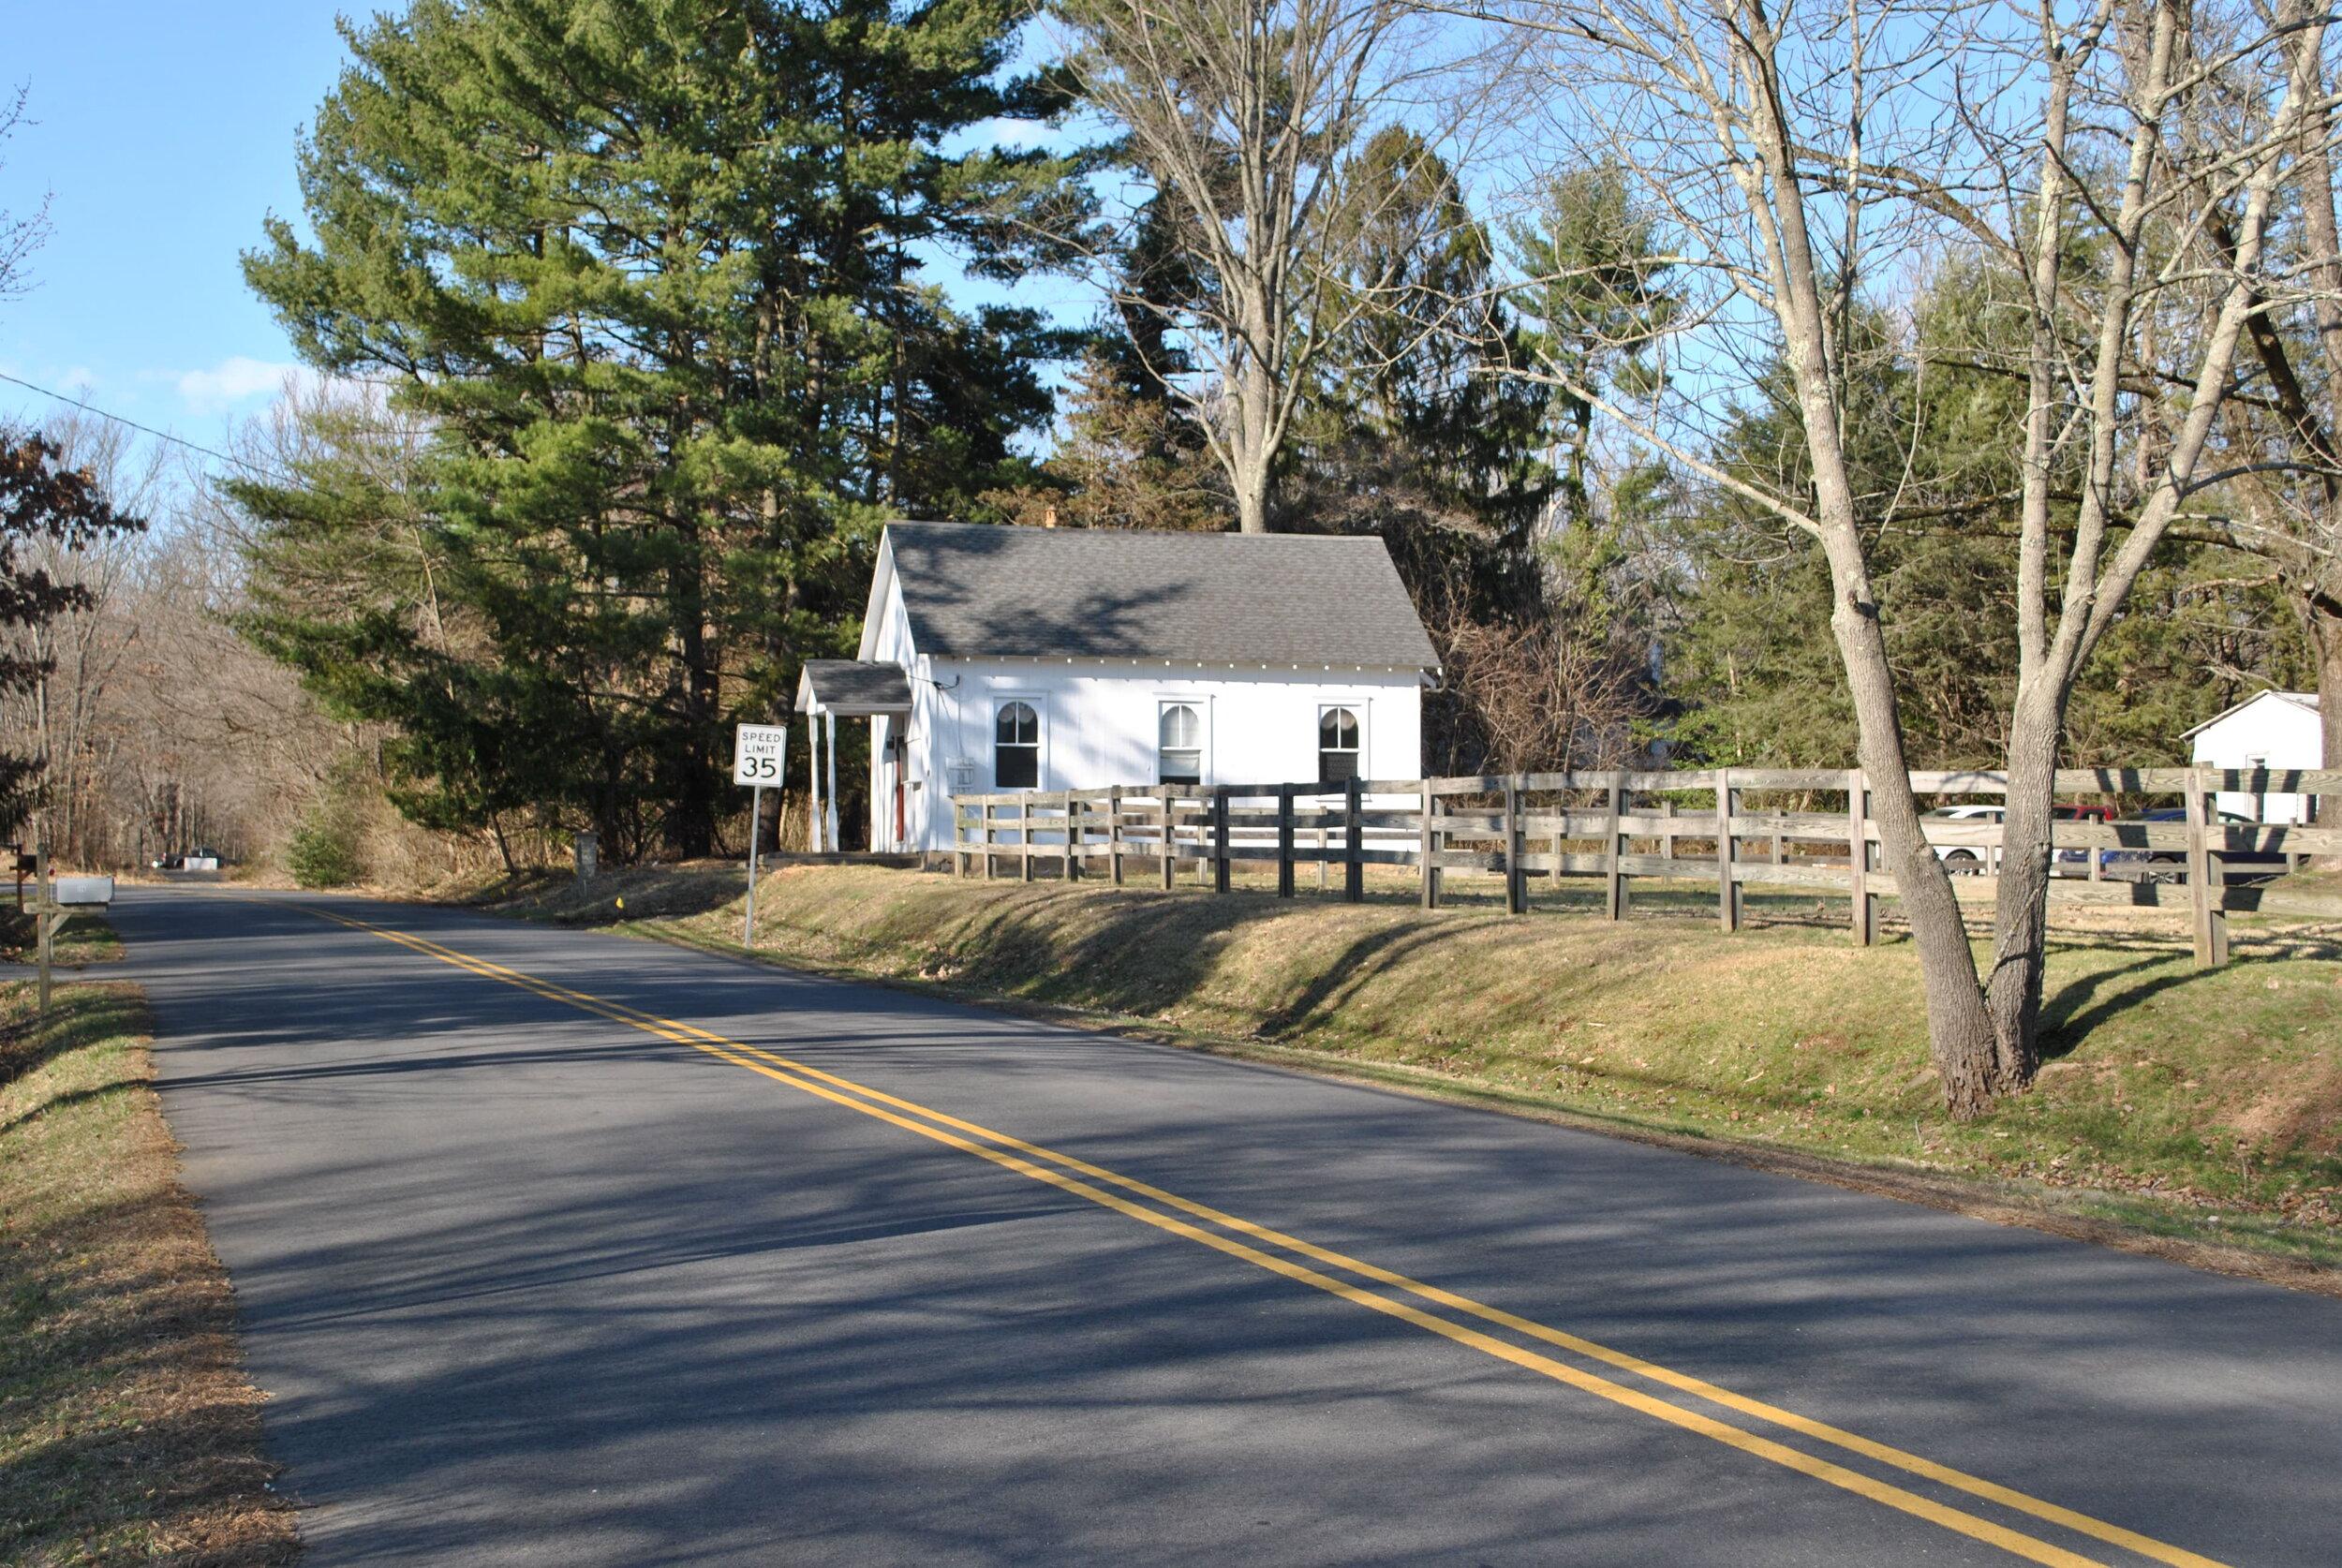 NJ_Somerset County_Mount Zion African Methodist Episcopal (AME) Church_0001.JPG